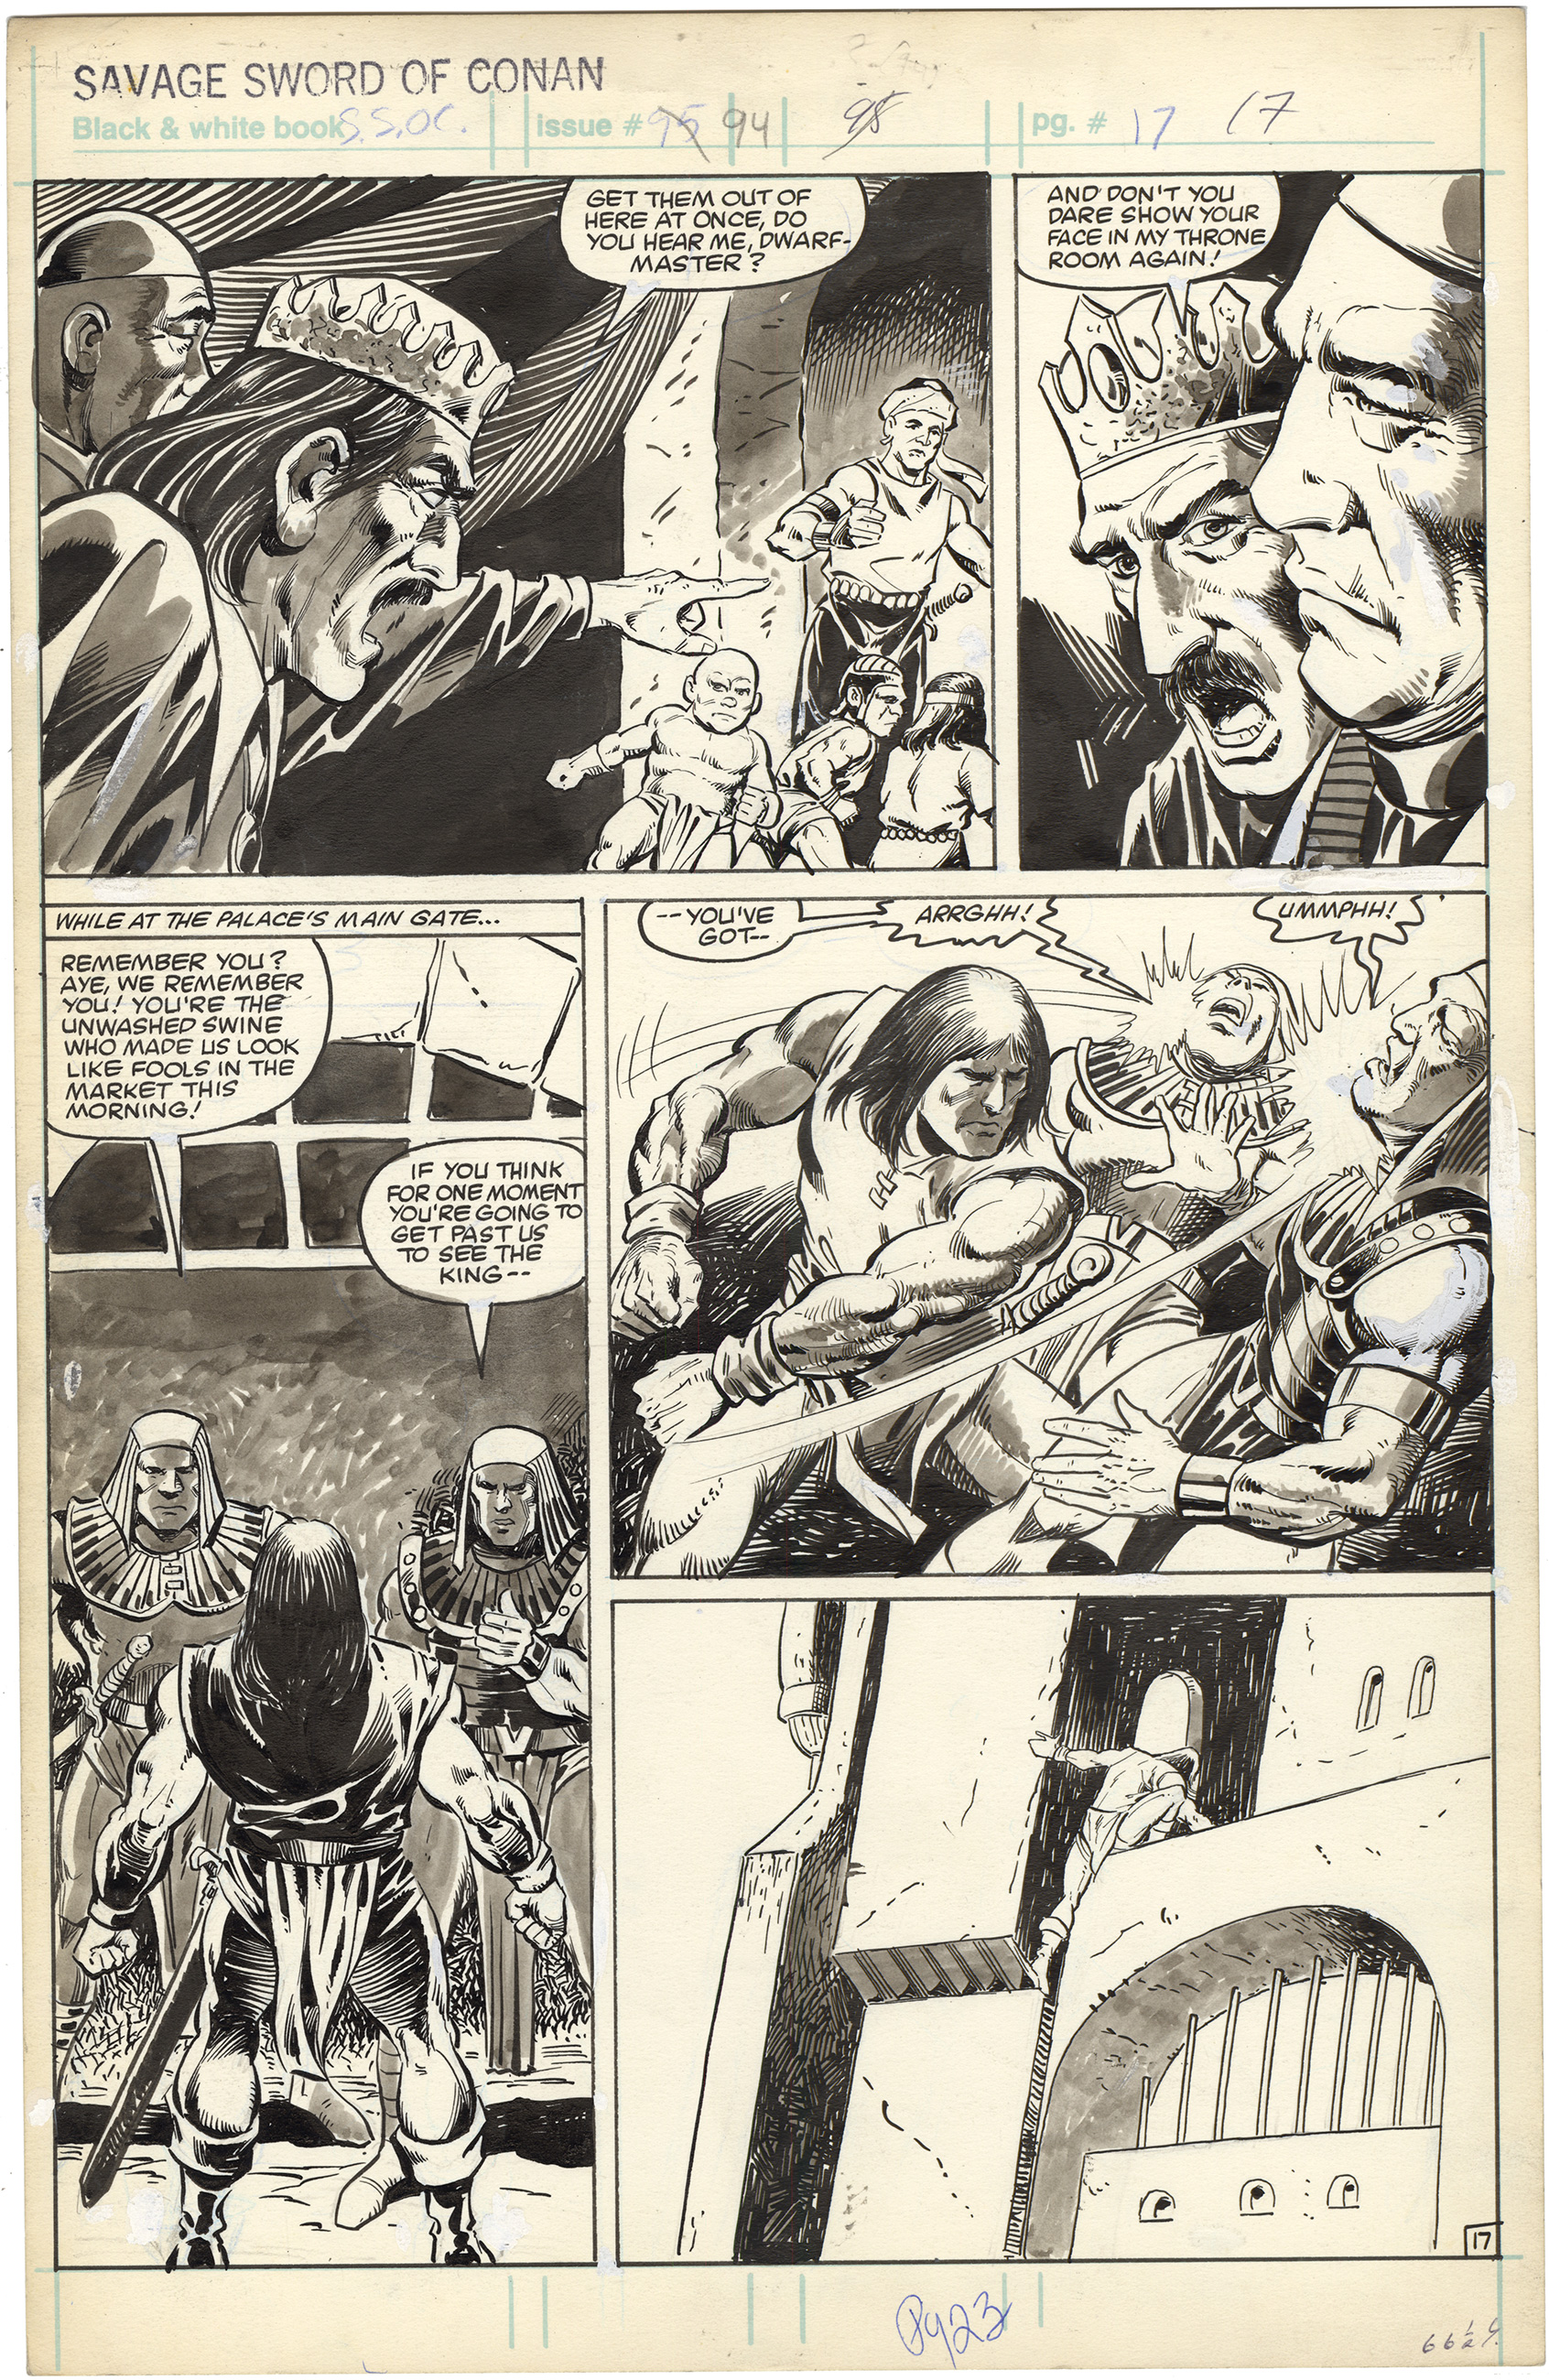 Savage Sword of Conan #94 p17